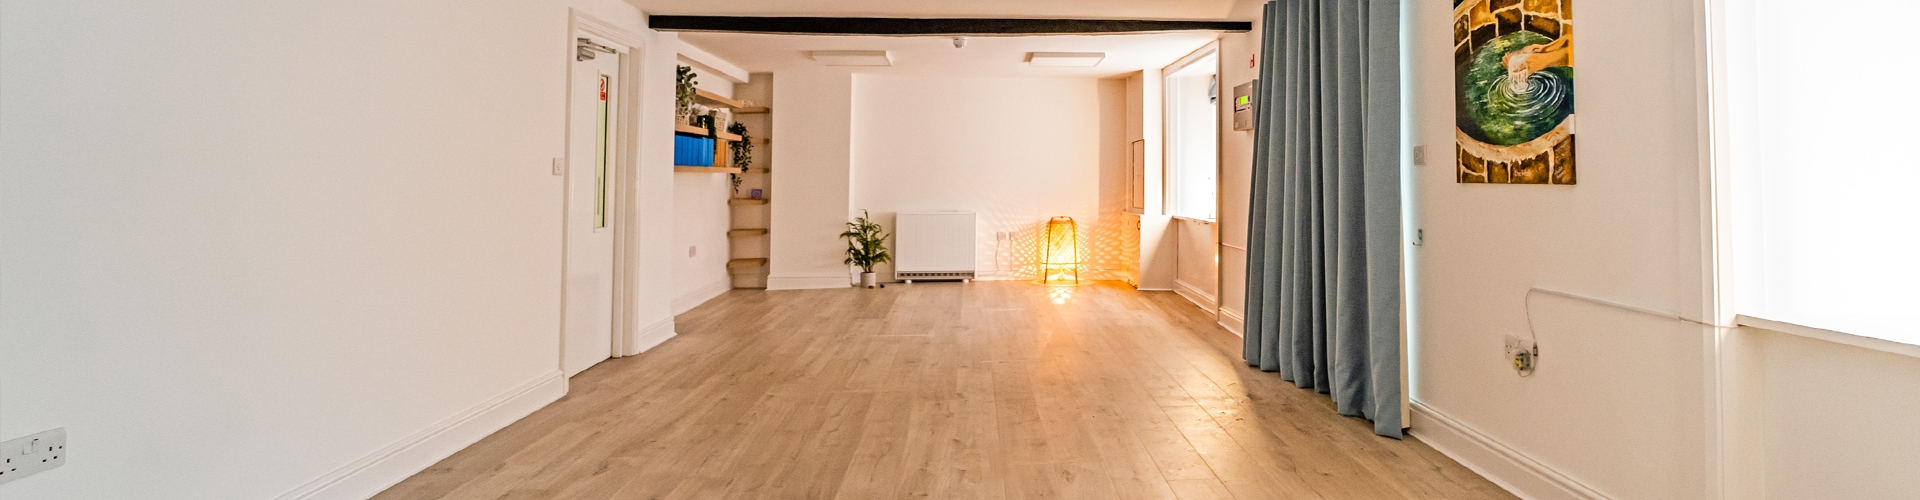 Wellbeing studio in Brackley